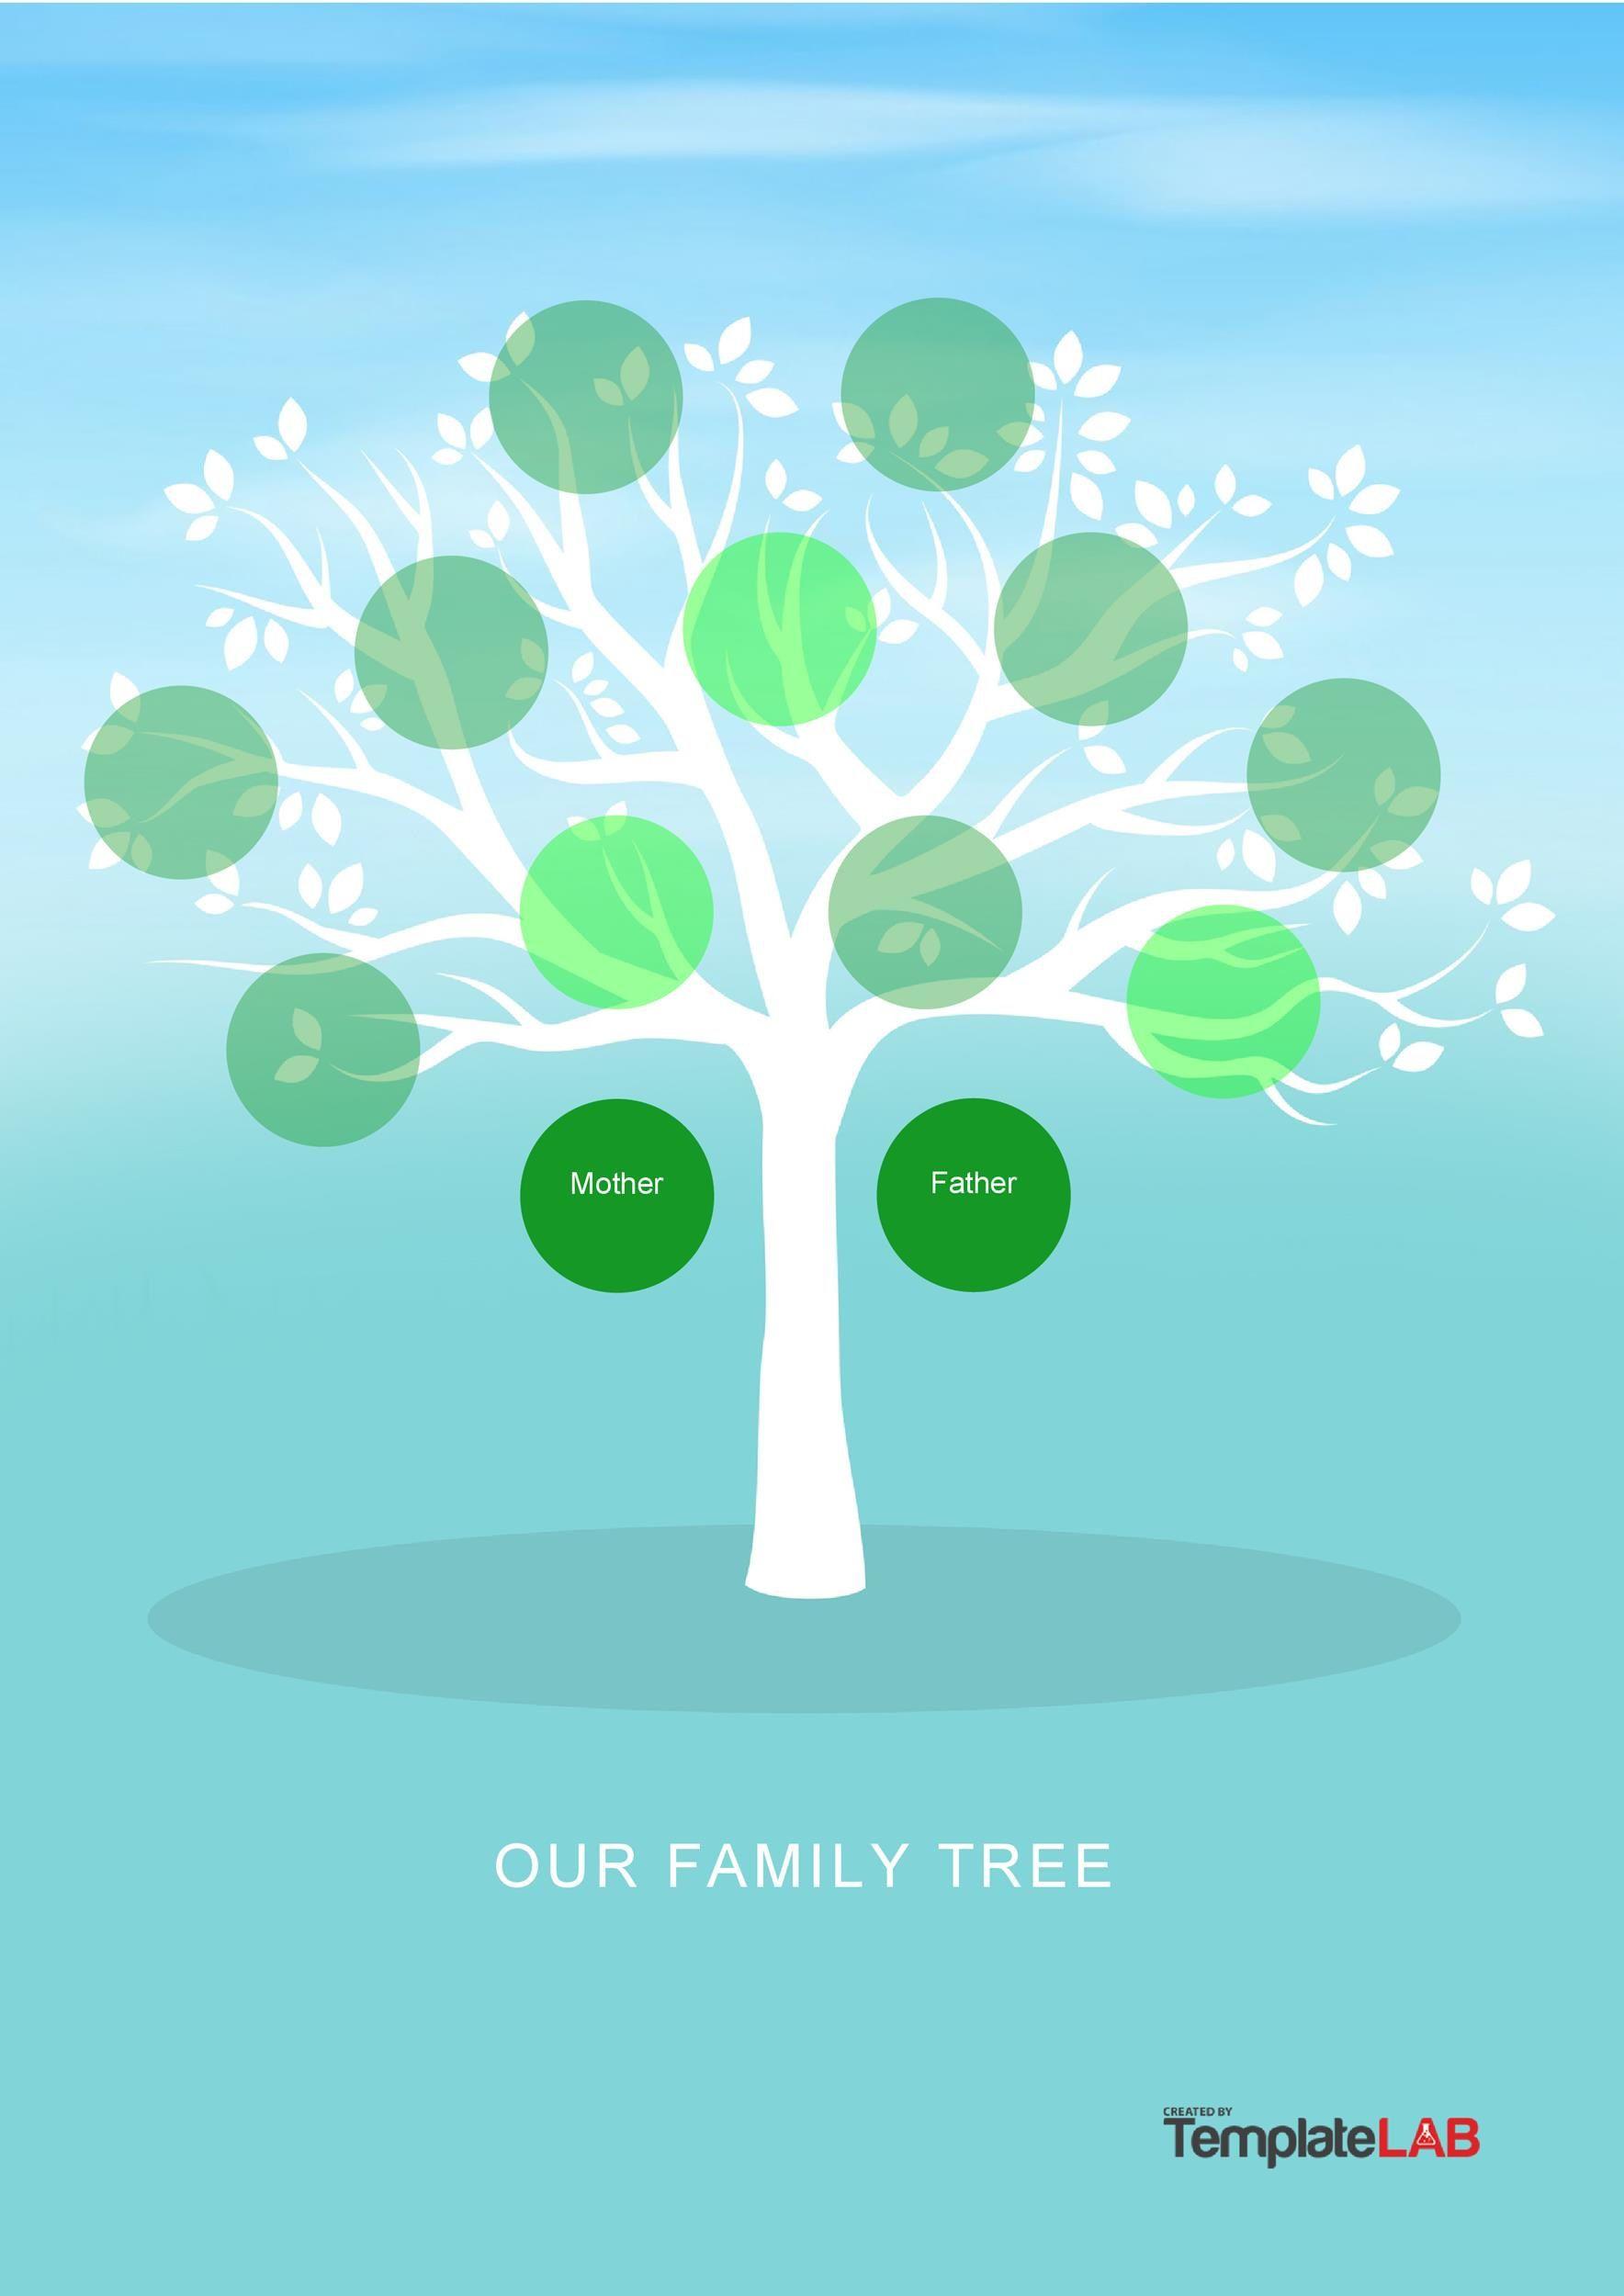 009 Dreaded Family Tree Book Template Word Photo  HistoryFull